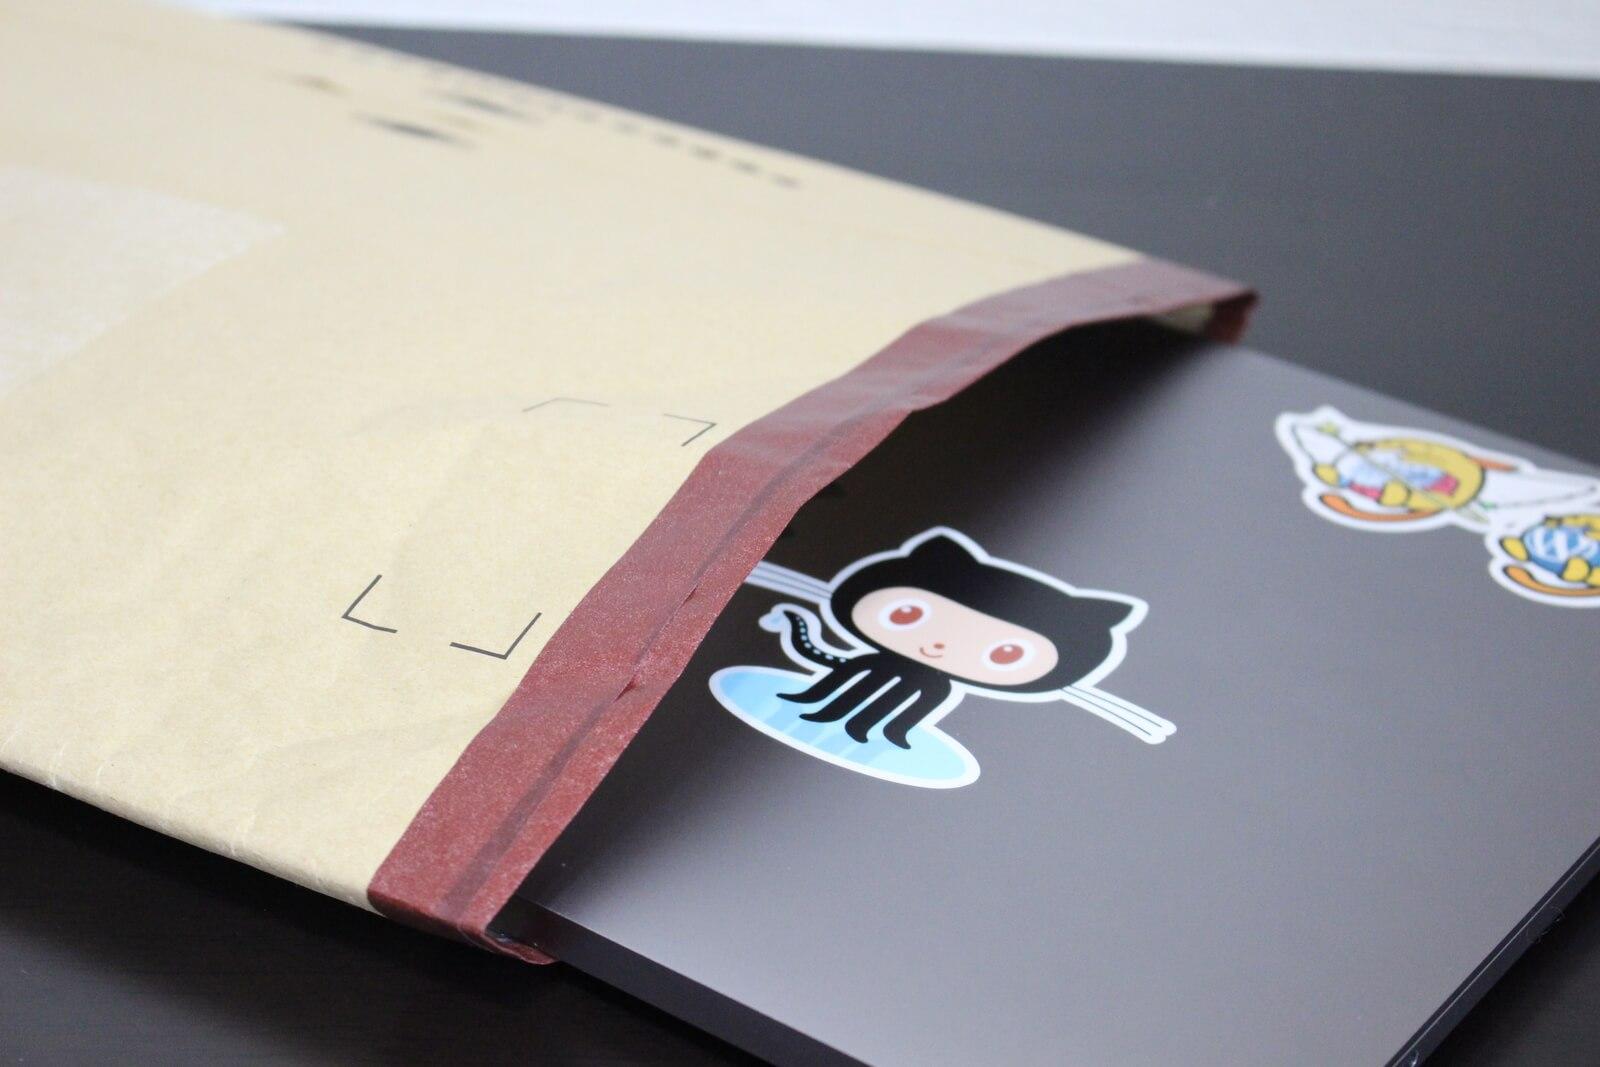 Amazonの梱包袋で作る、お手軽PCケースがシンプルイズベスト